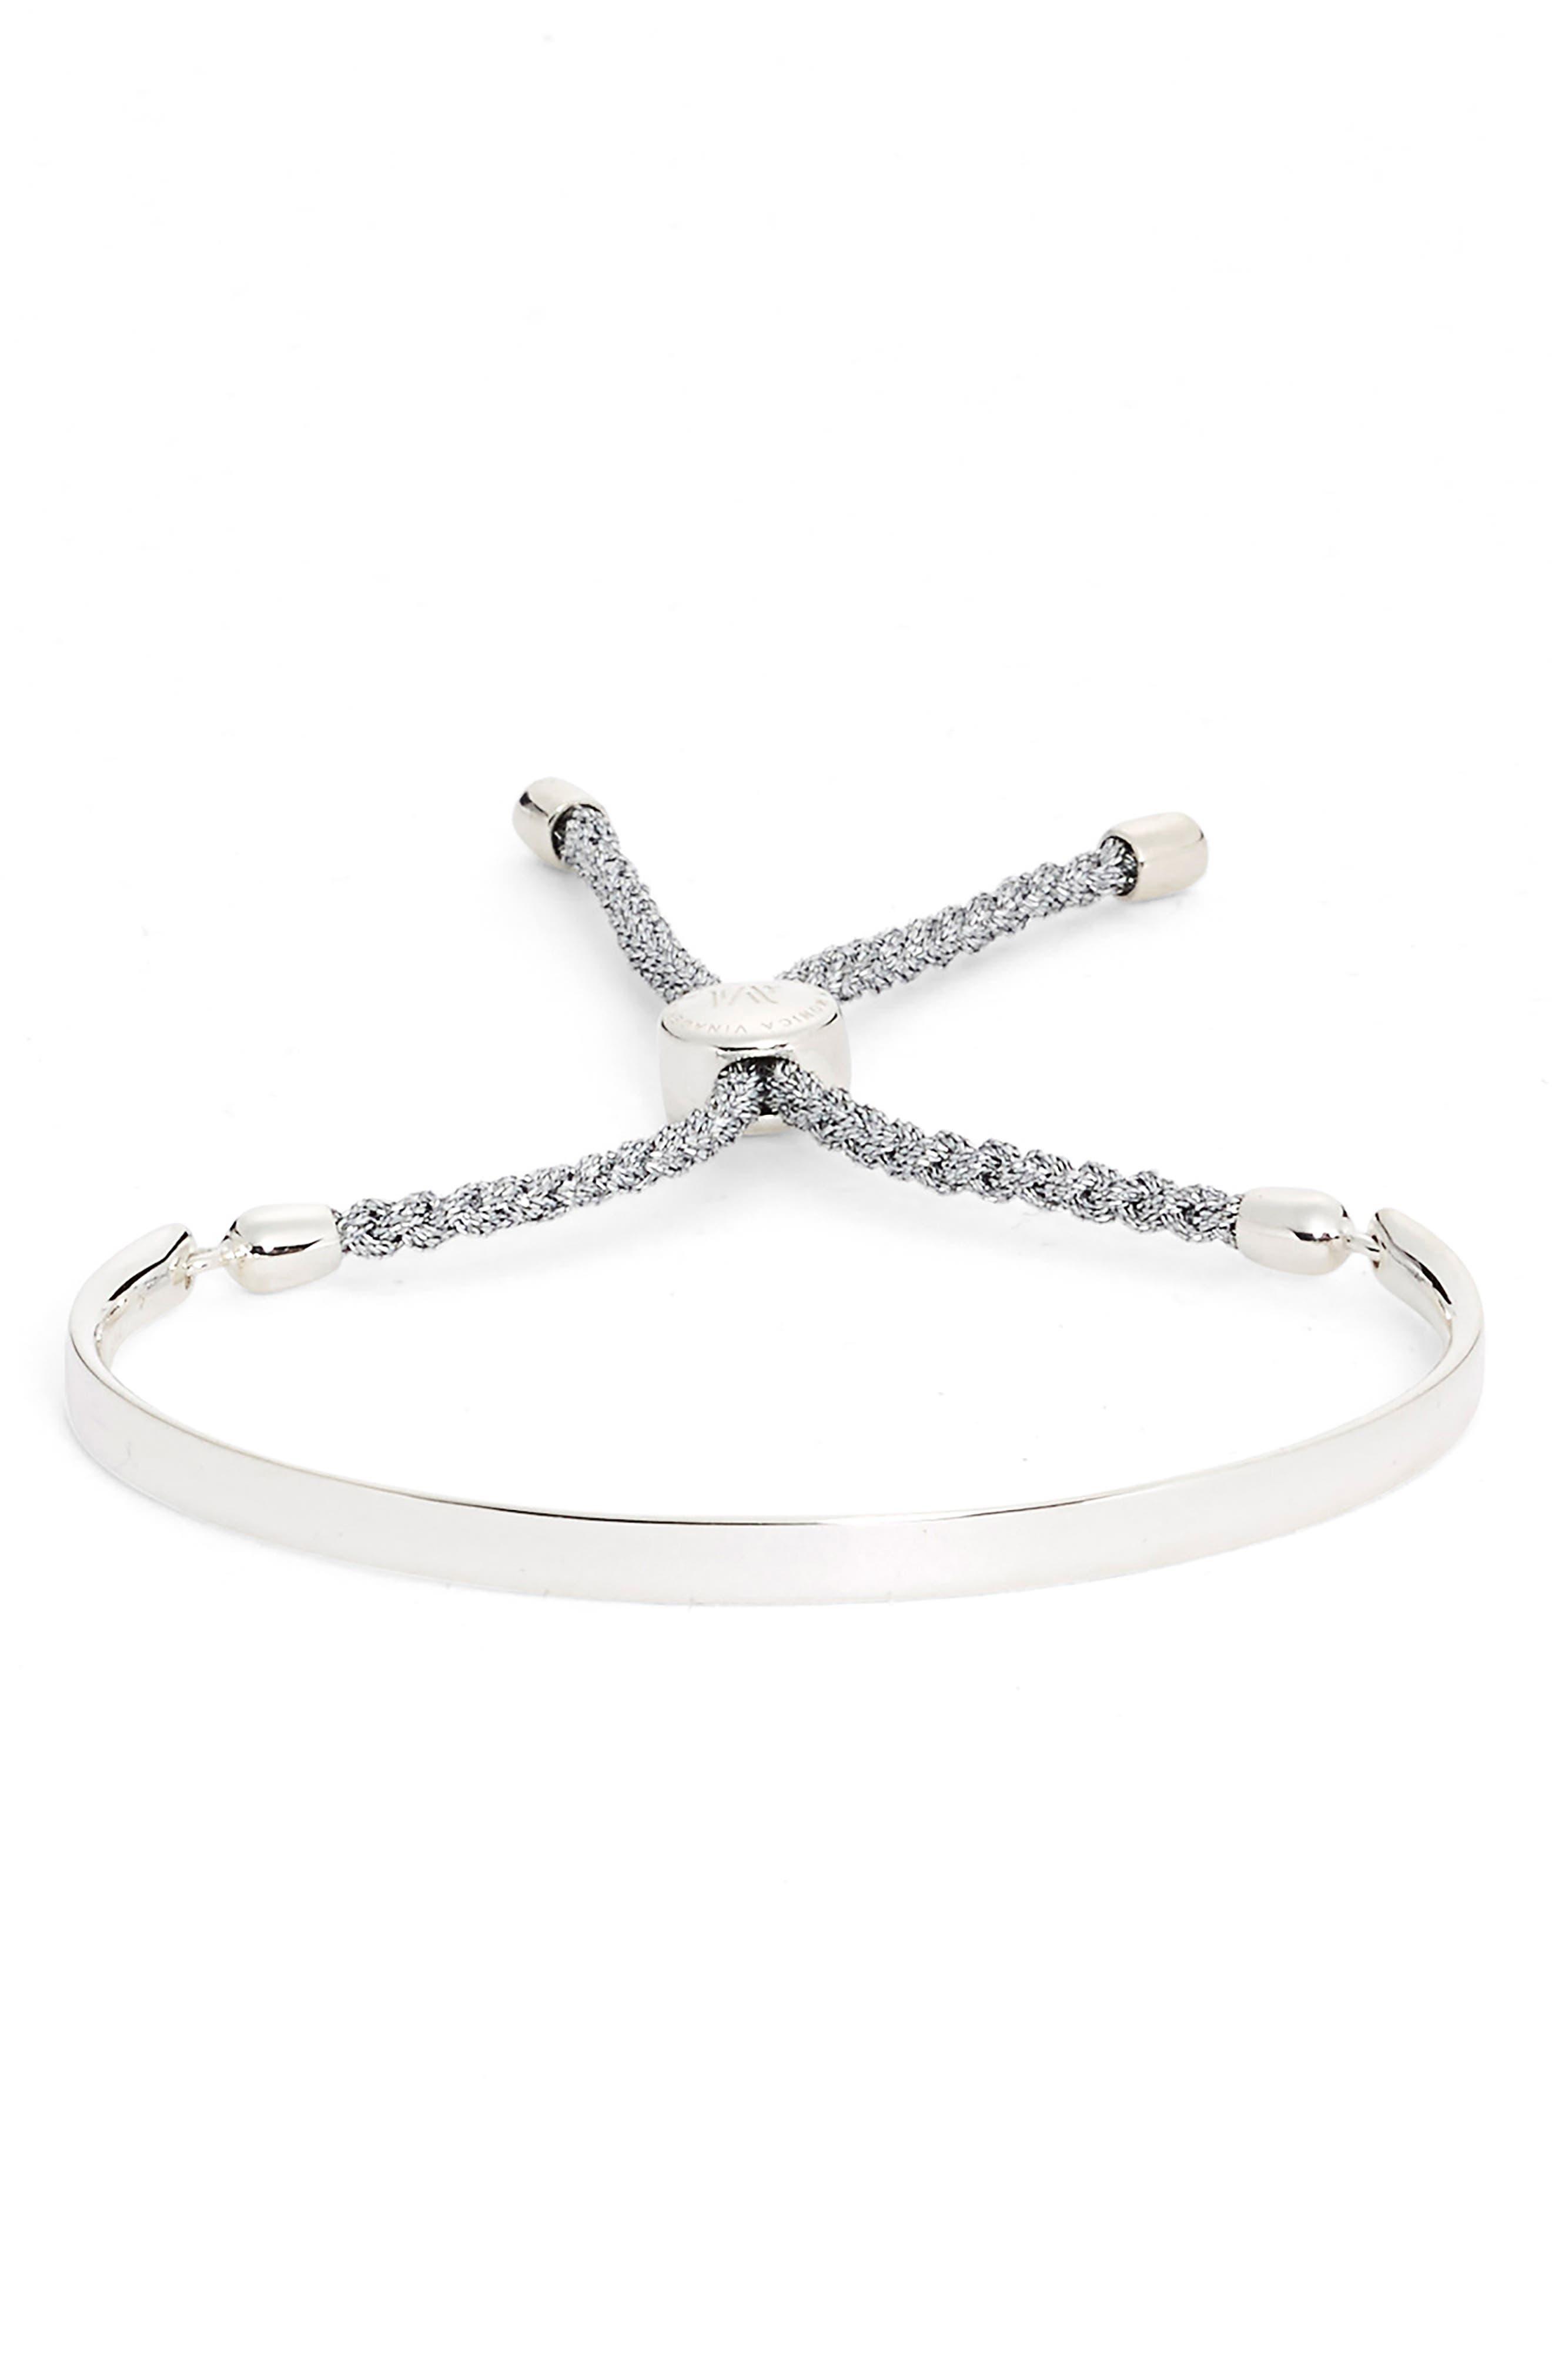 Engravable Fiji Friendship Bracelet,                         Main,                         color, SILVER/ SILVER